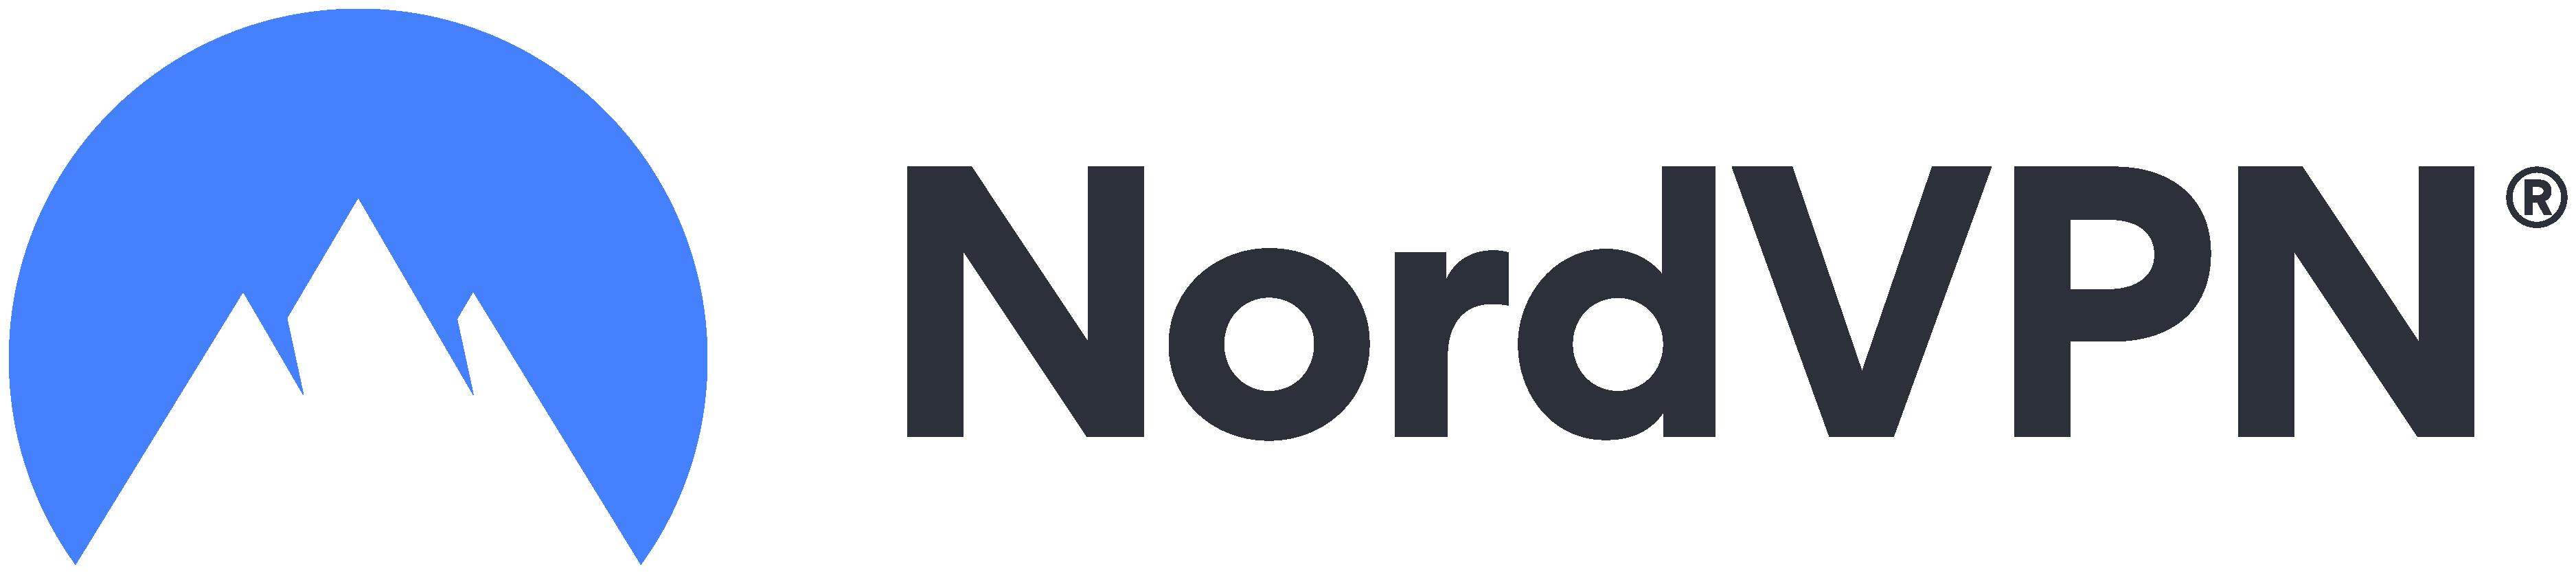 NordVPN The Most Powerful VPN to stream ThreeNow